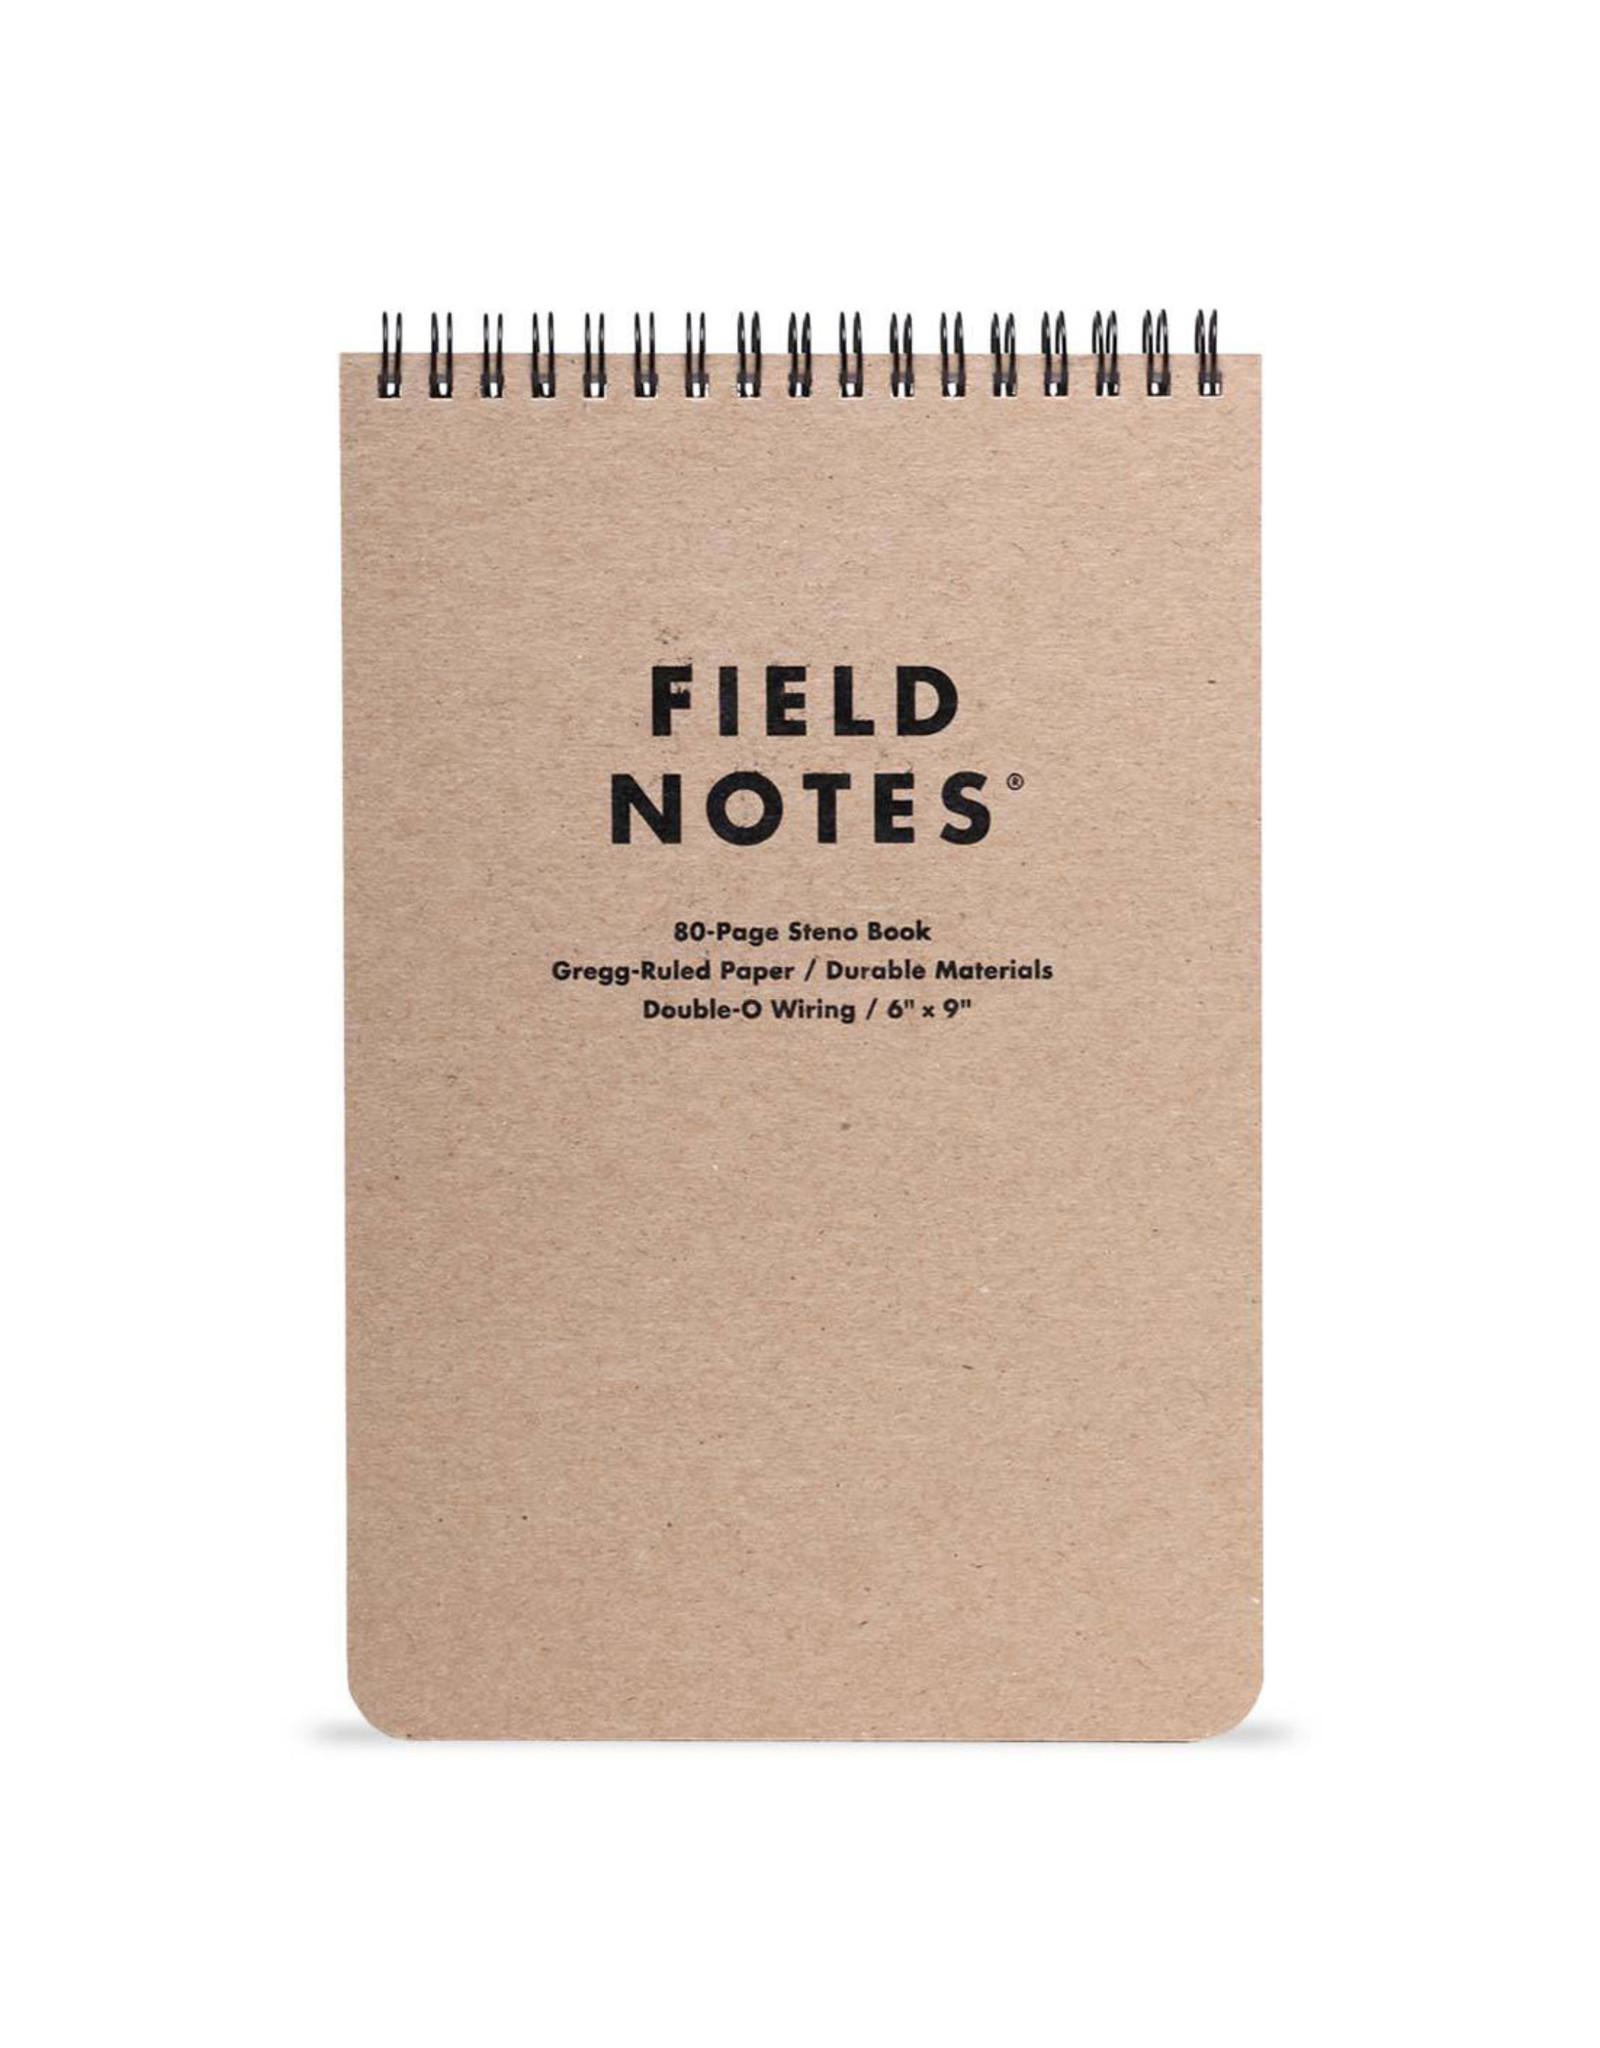 Field Notes Brand 80-Page Steno Book